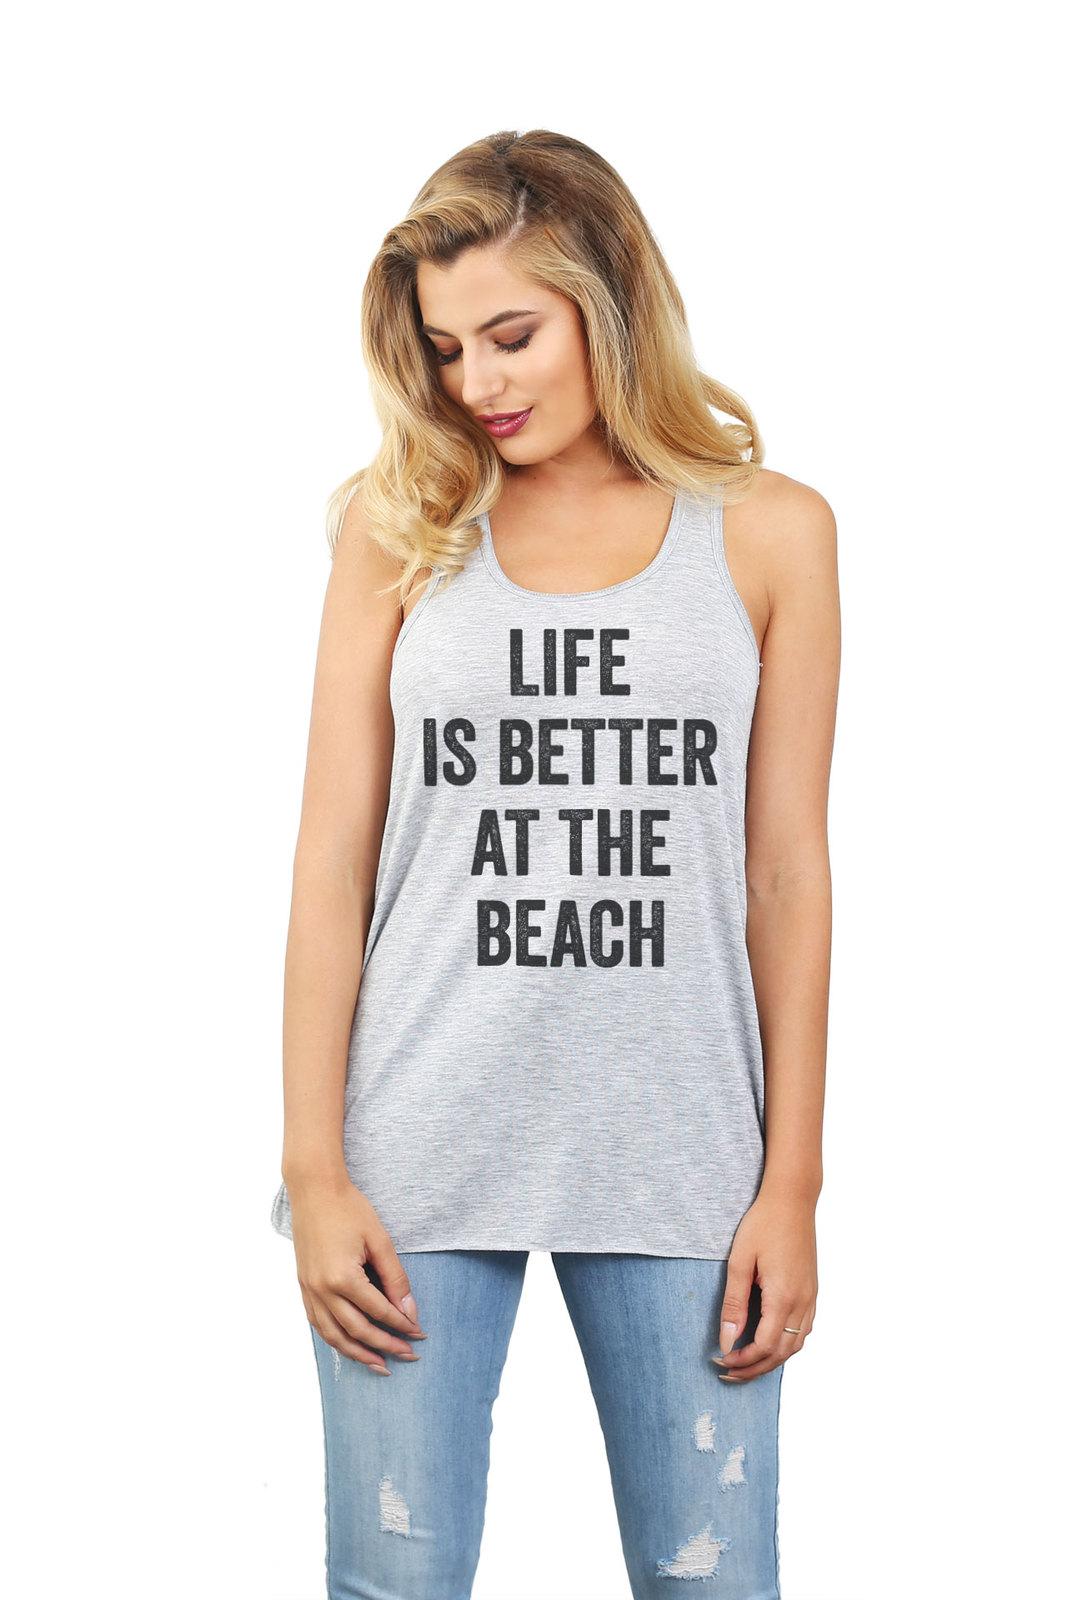 Thread Tank Life Is Better Beach Women's Sleeveless Flowy Racerback Tank Top Spo